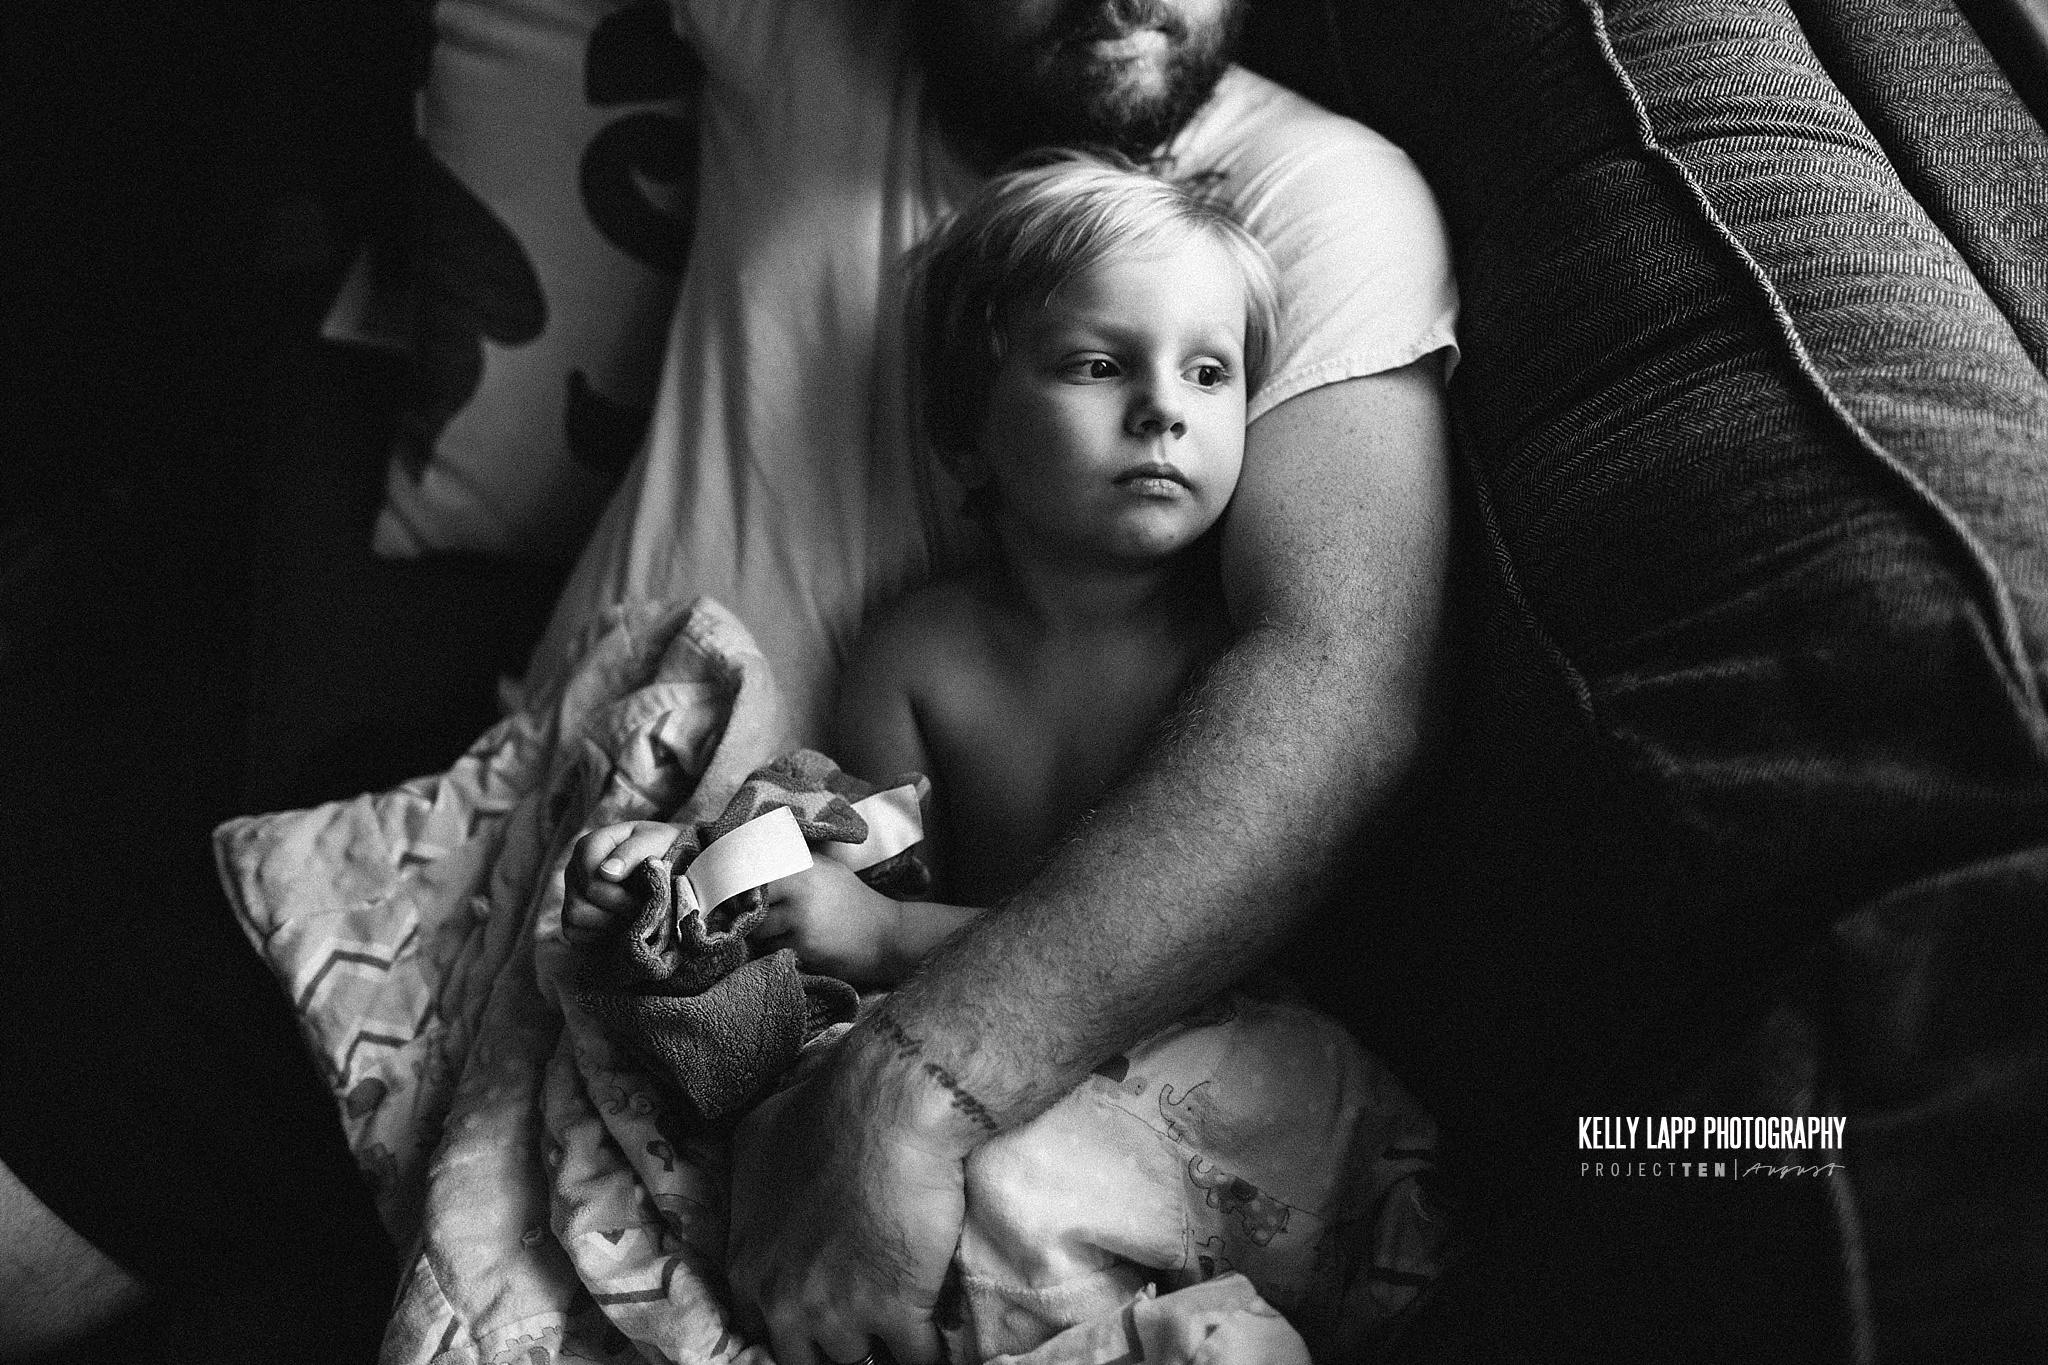 KellyLappPhotography_familyphotojournalism_projectten_august2017_04.JPG